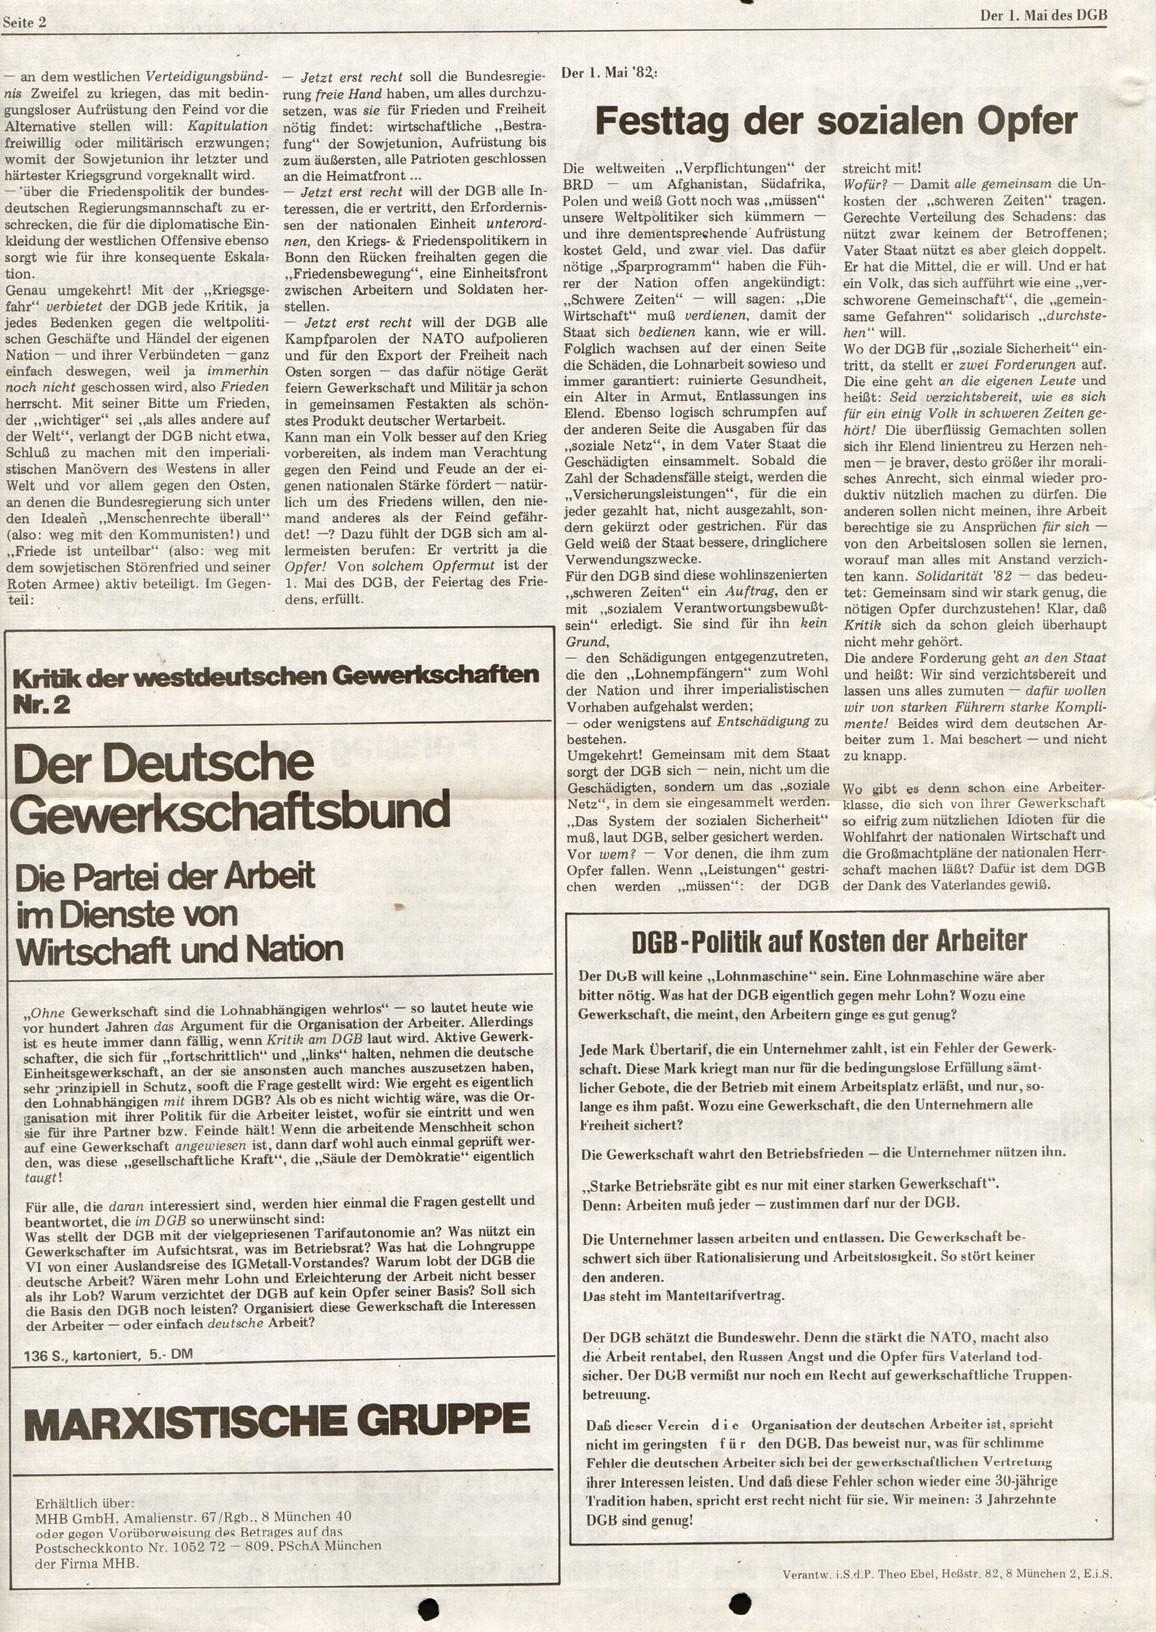 Berlin_MG_FB_19820426_02